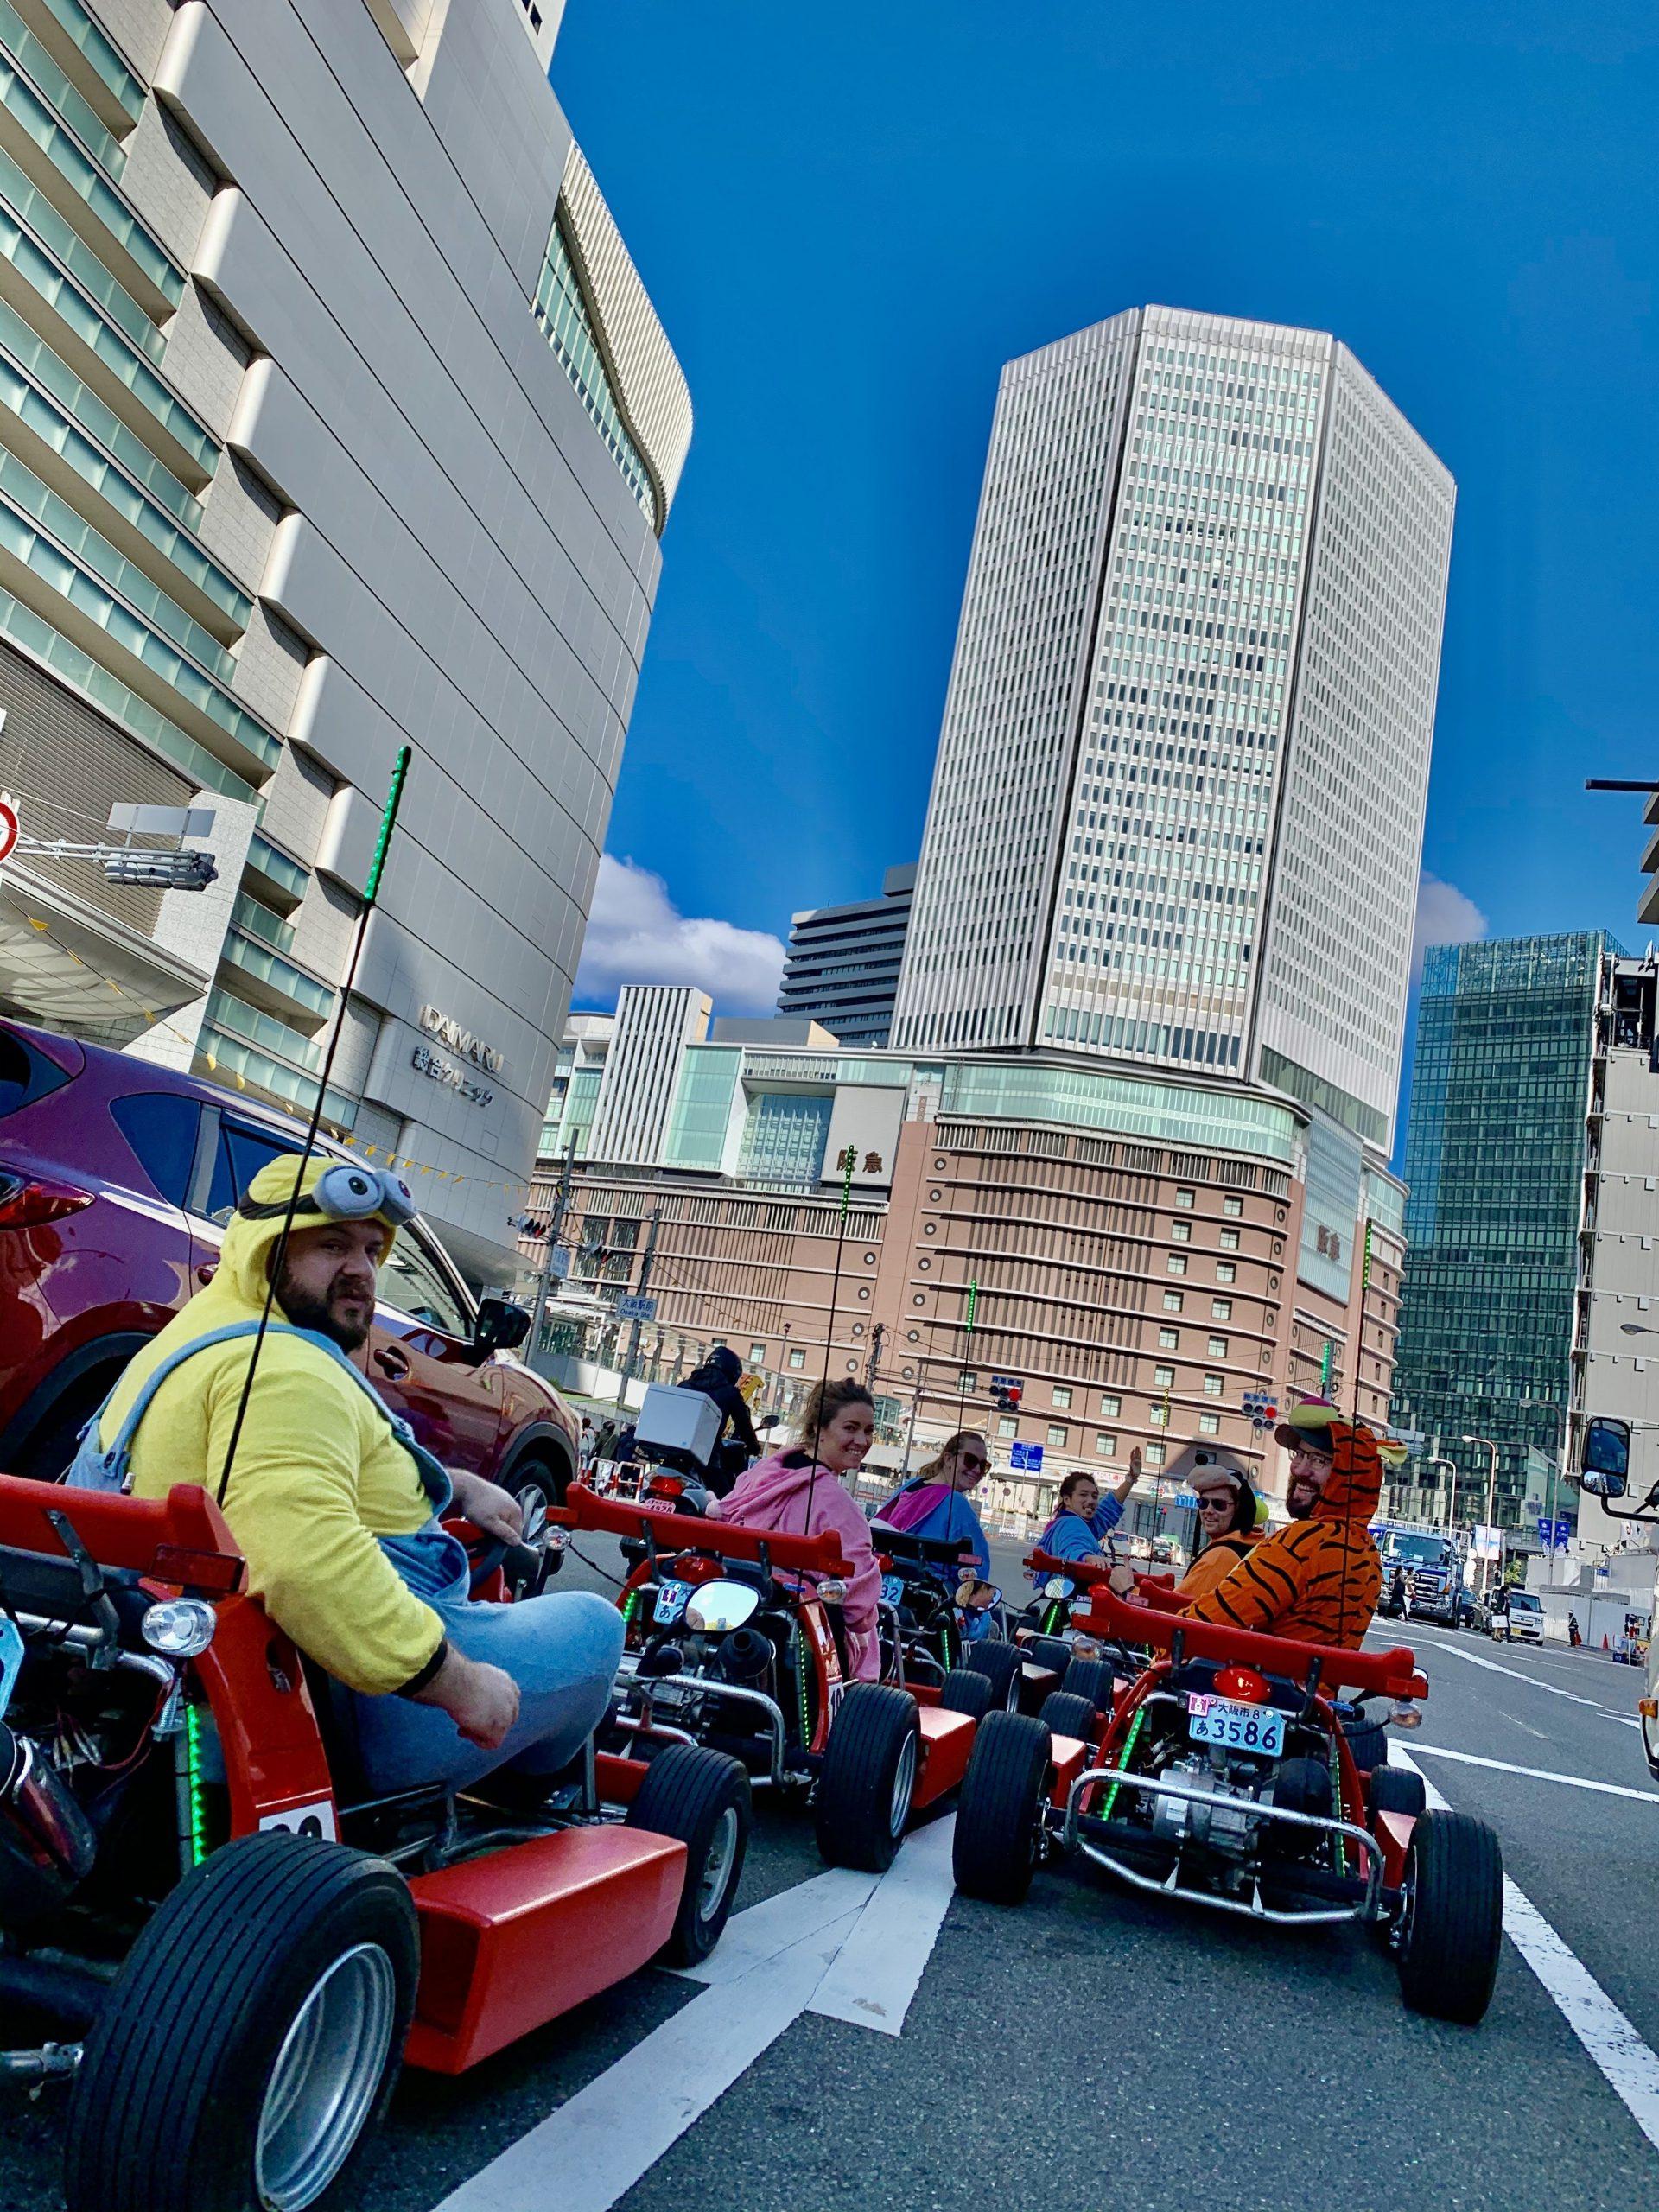 4 4 scaled - 任天堂を舐めくさってた公道マリオカートさん、経営難でクラウドファンディングに頼るも500円しか集まらない